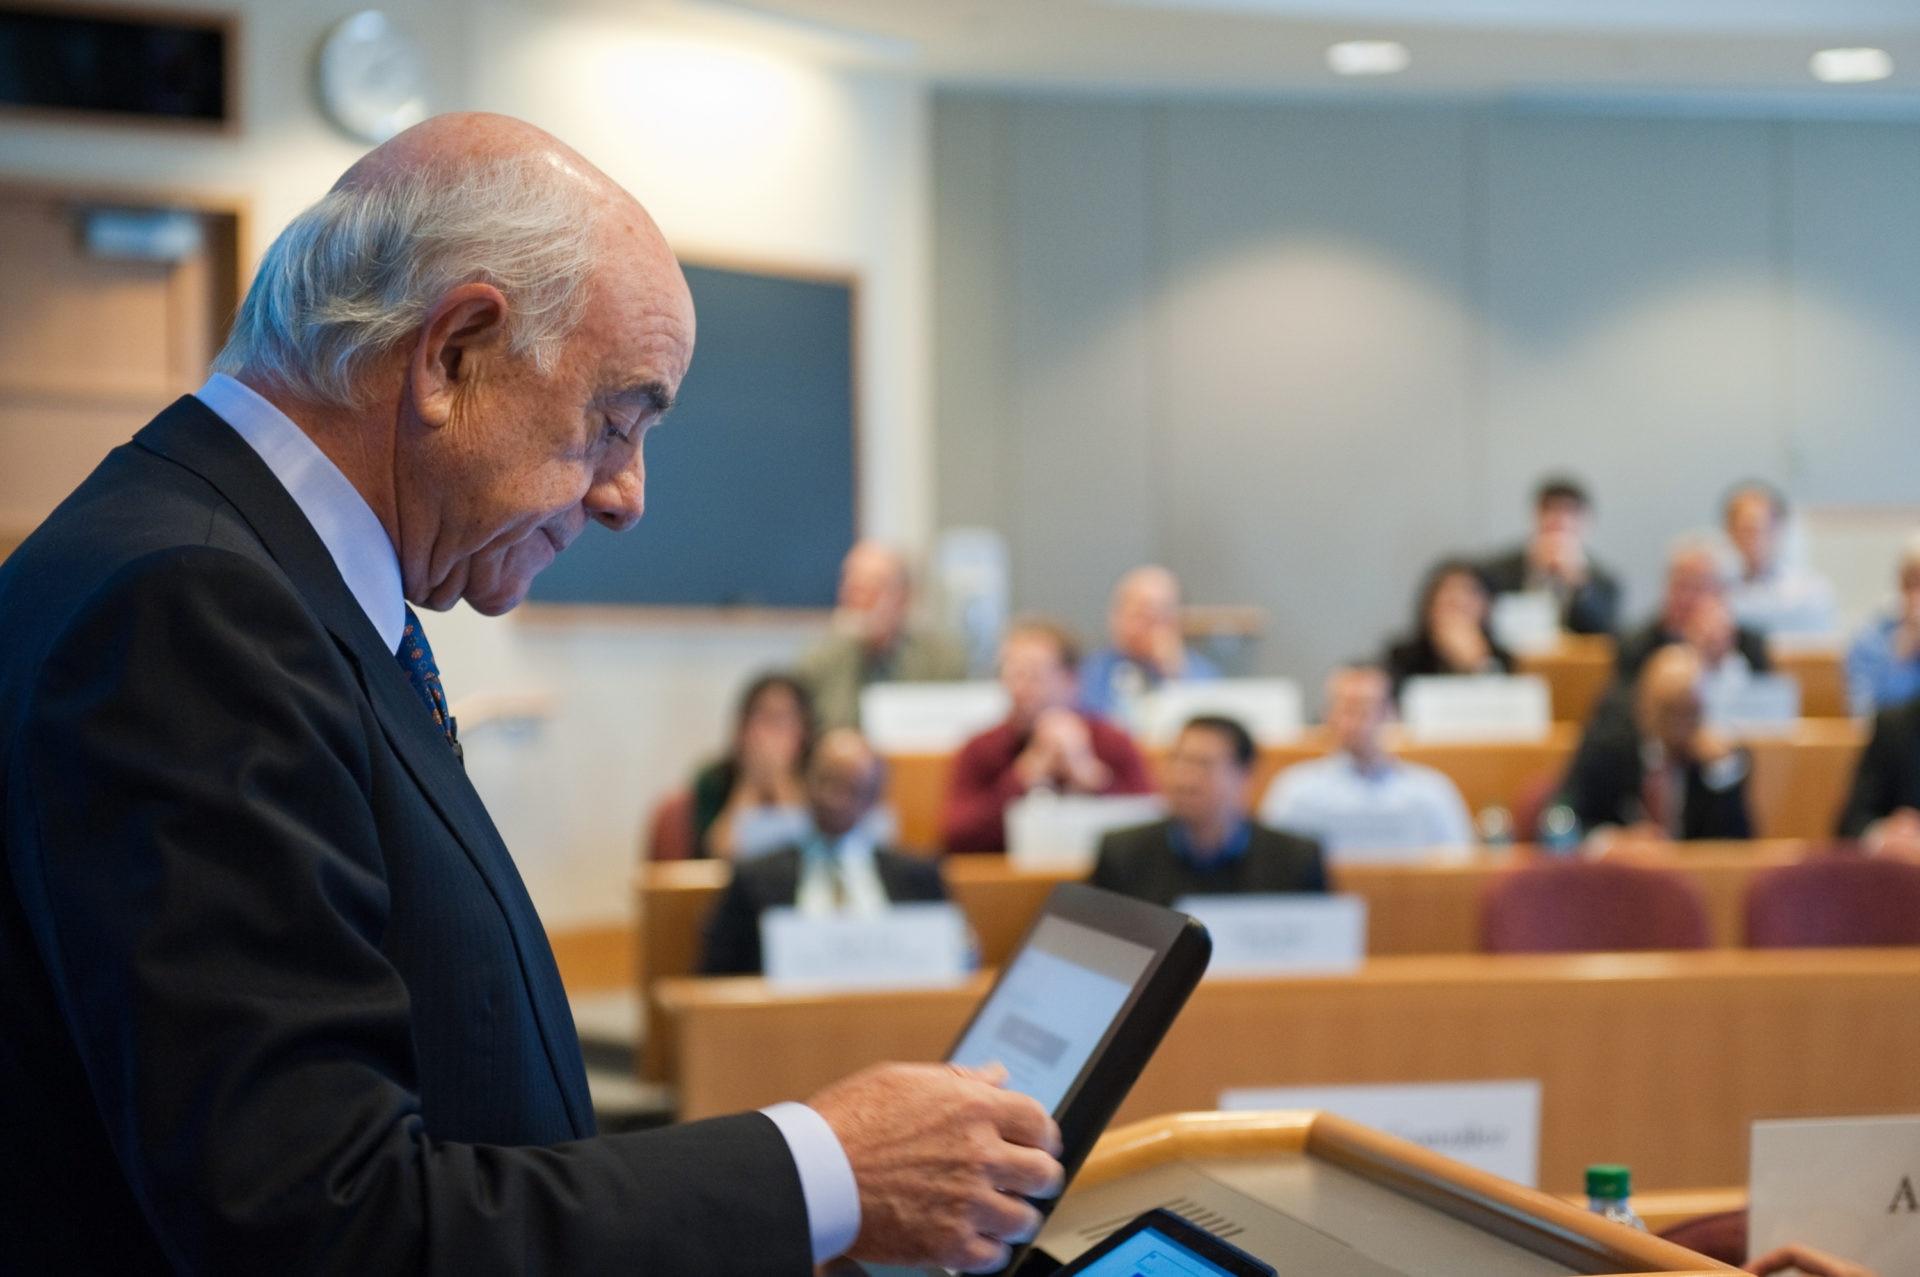 Francisco González in the Harvard Business School photograph BBVA